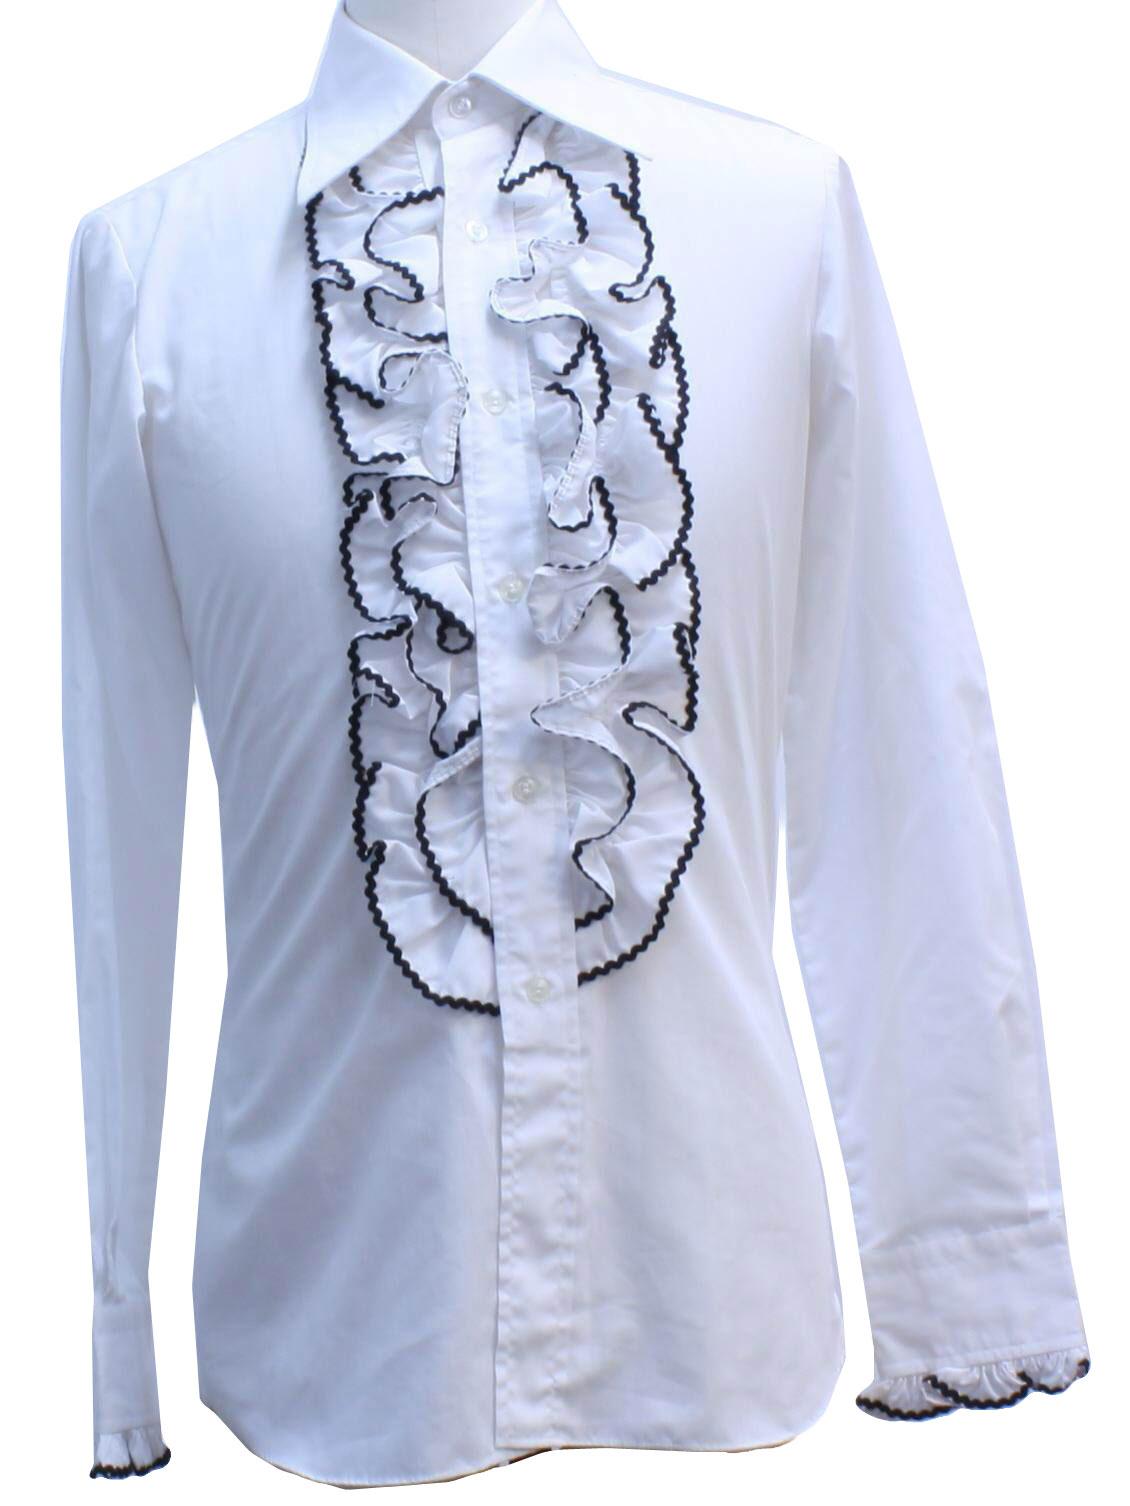 Womens Black Shirt With White Collar